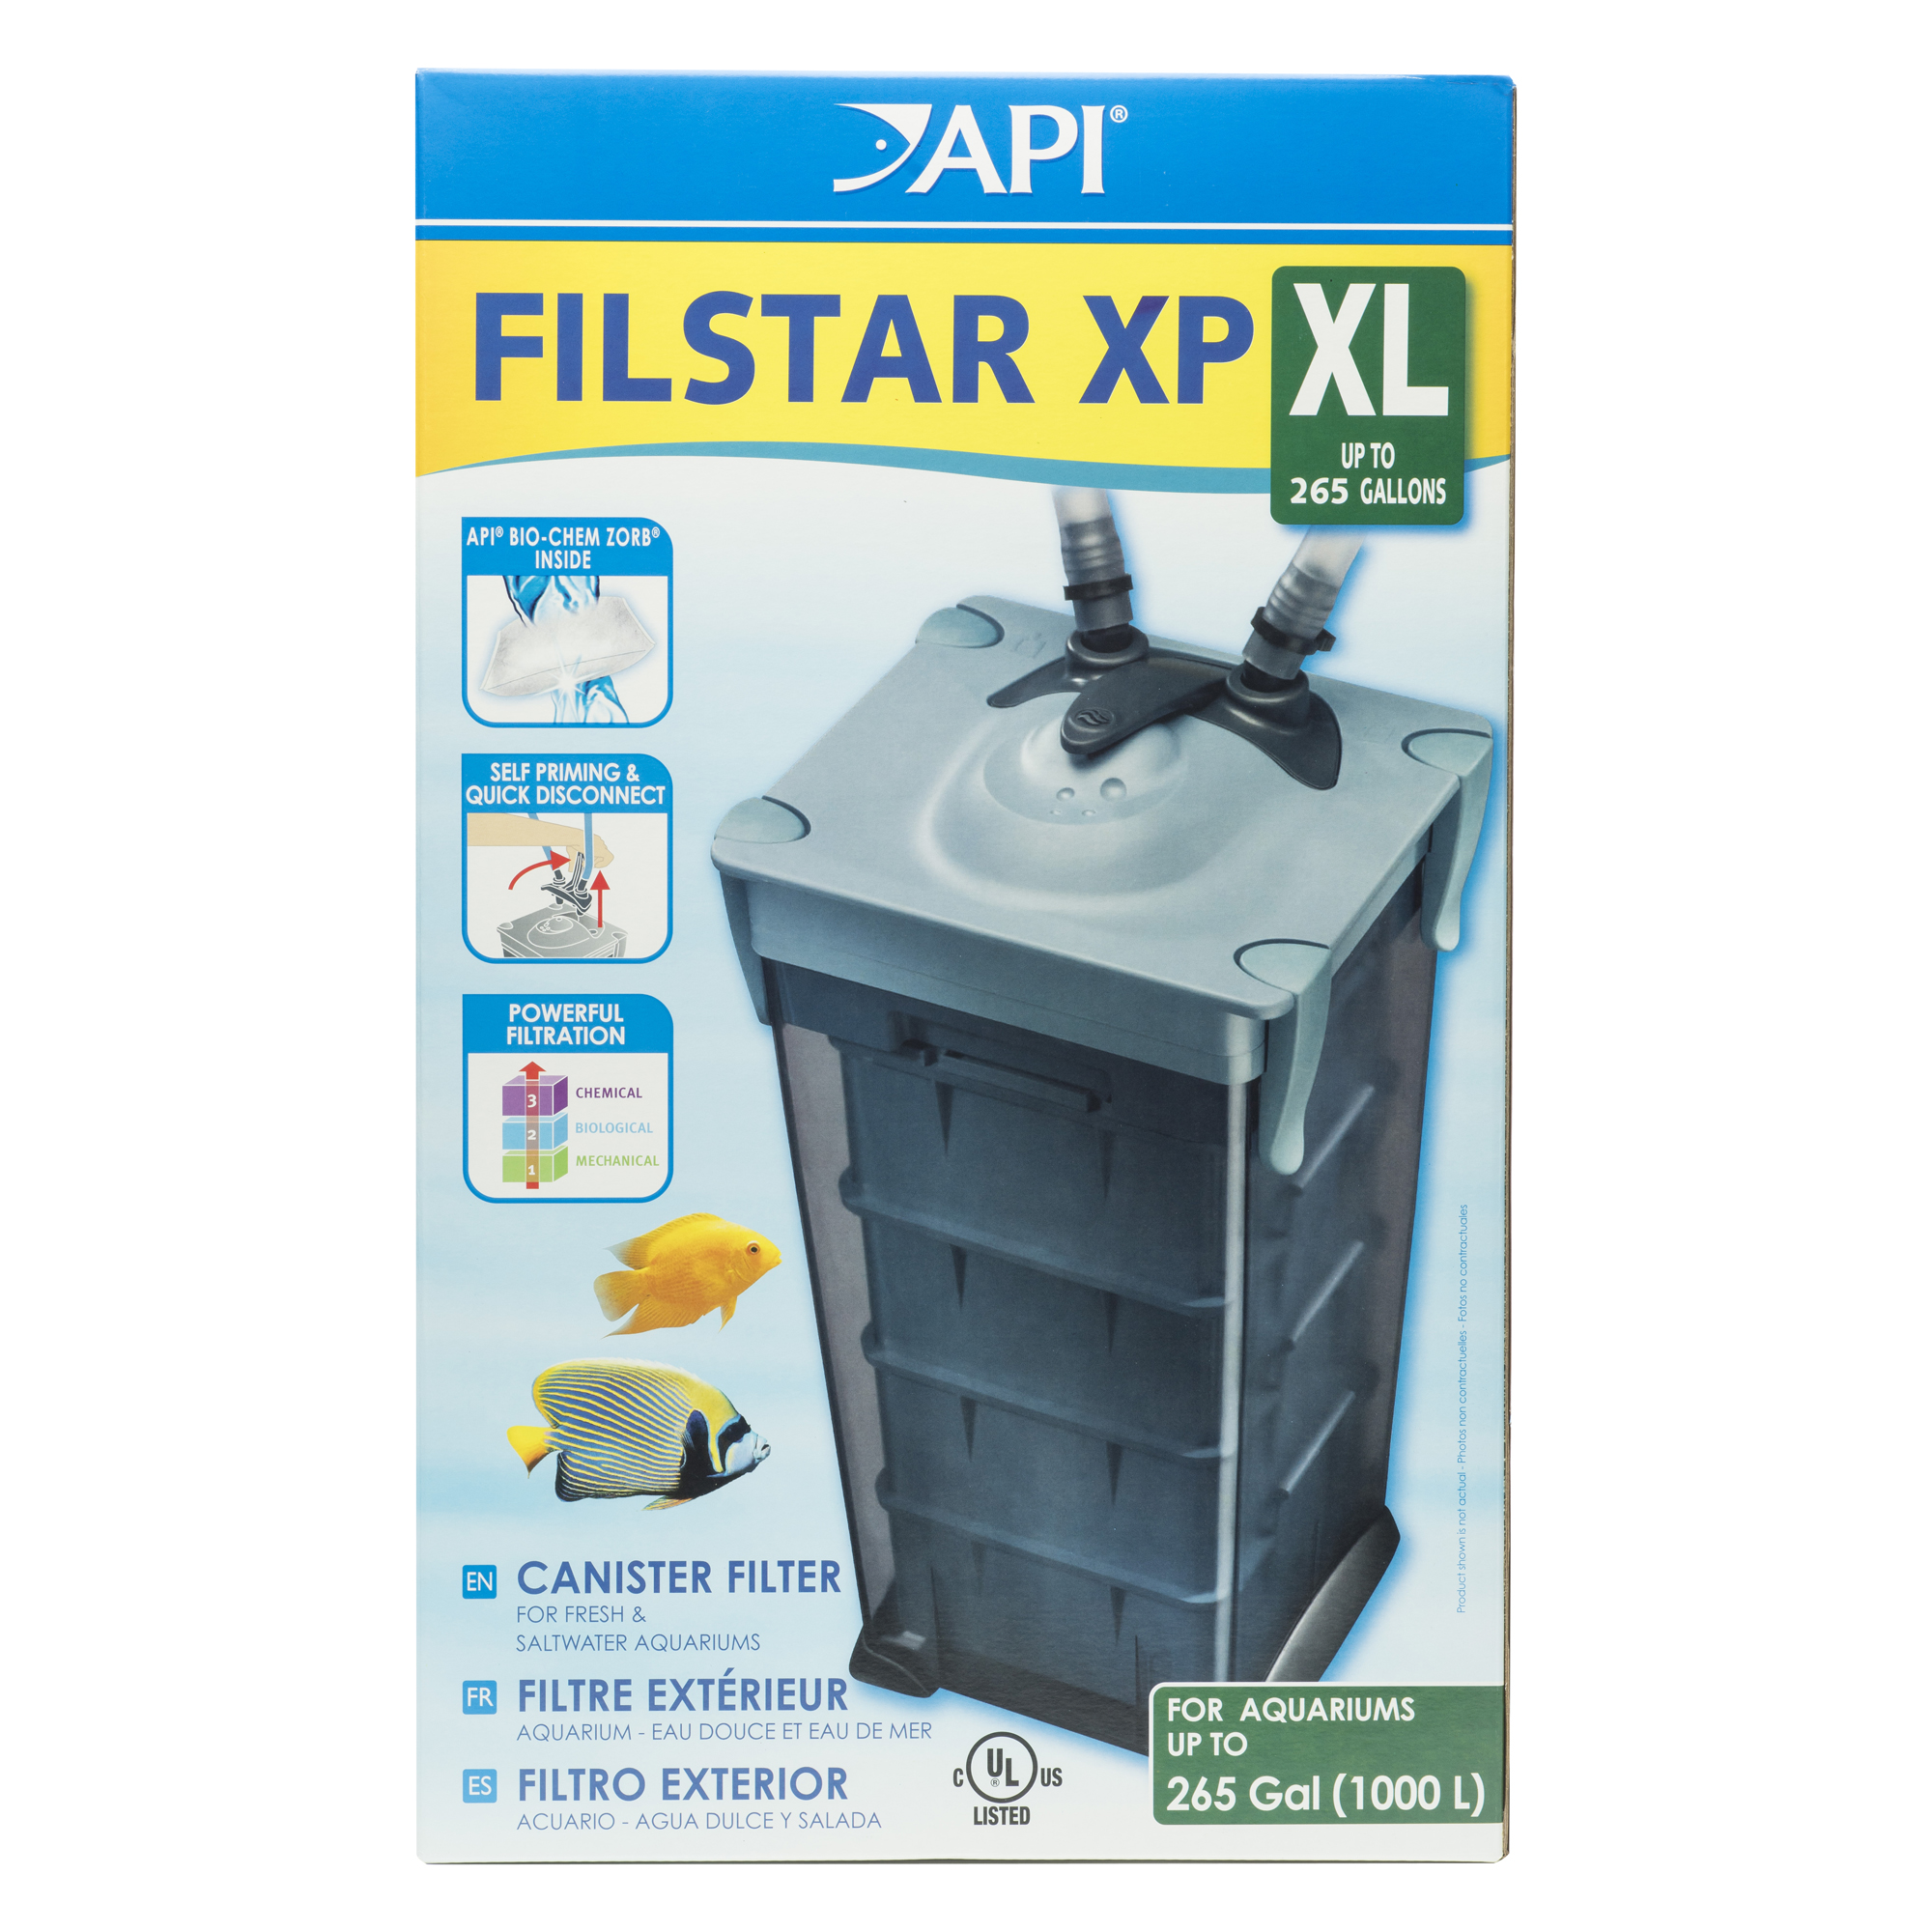 photo https://apifishcare.com/images/products-us/filstar-xp-filter/api-filstar-xp-filter-extra-large.jpg